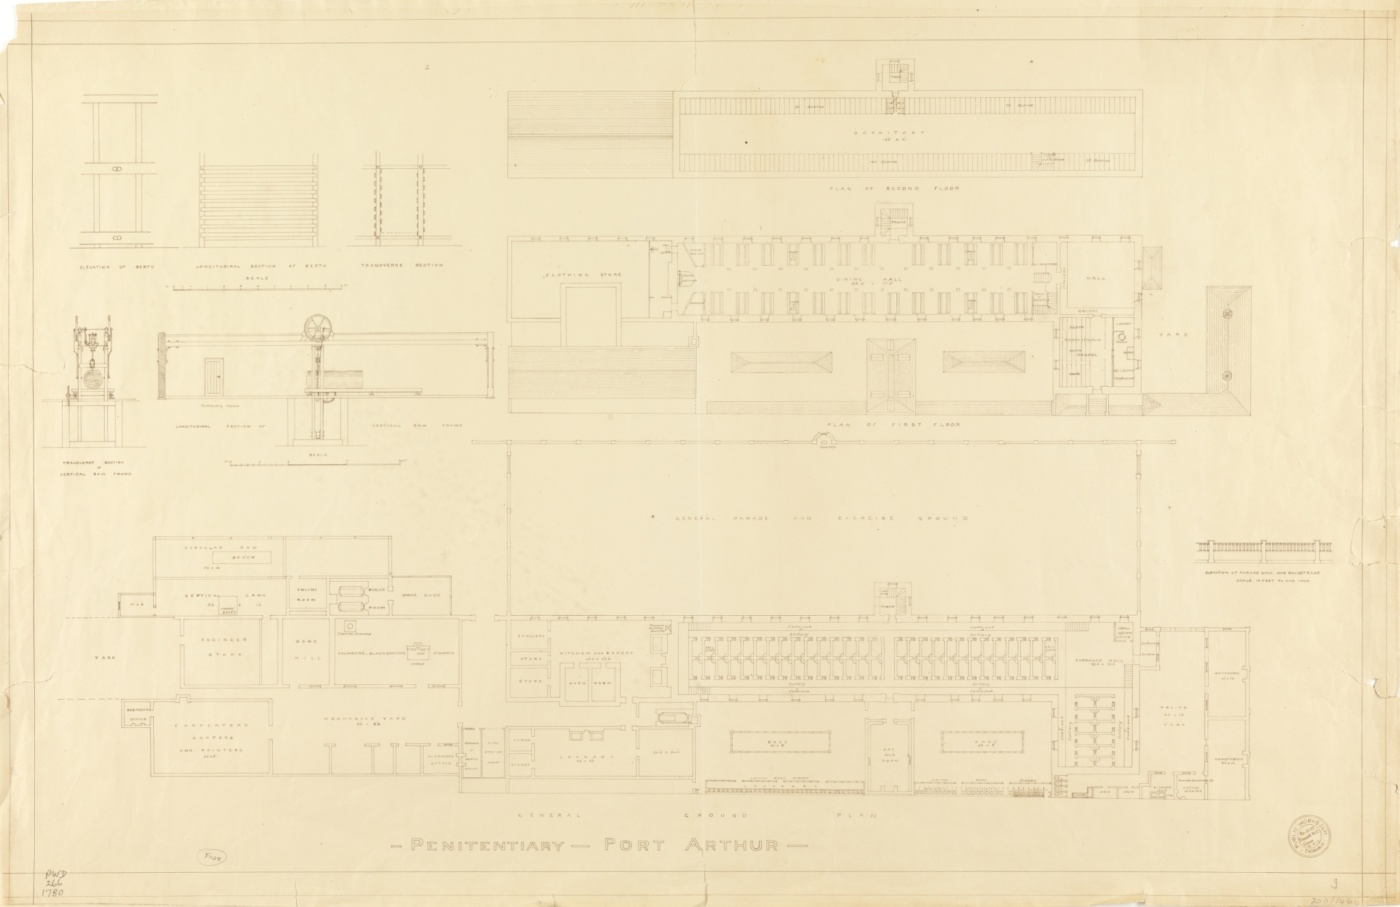 Port Arthur - penitentiary 1917. Tasmanian Archive Heritage Office